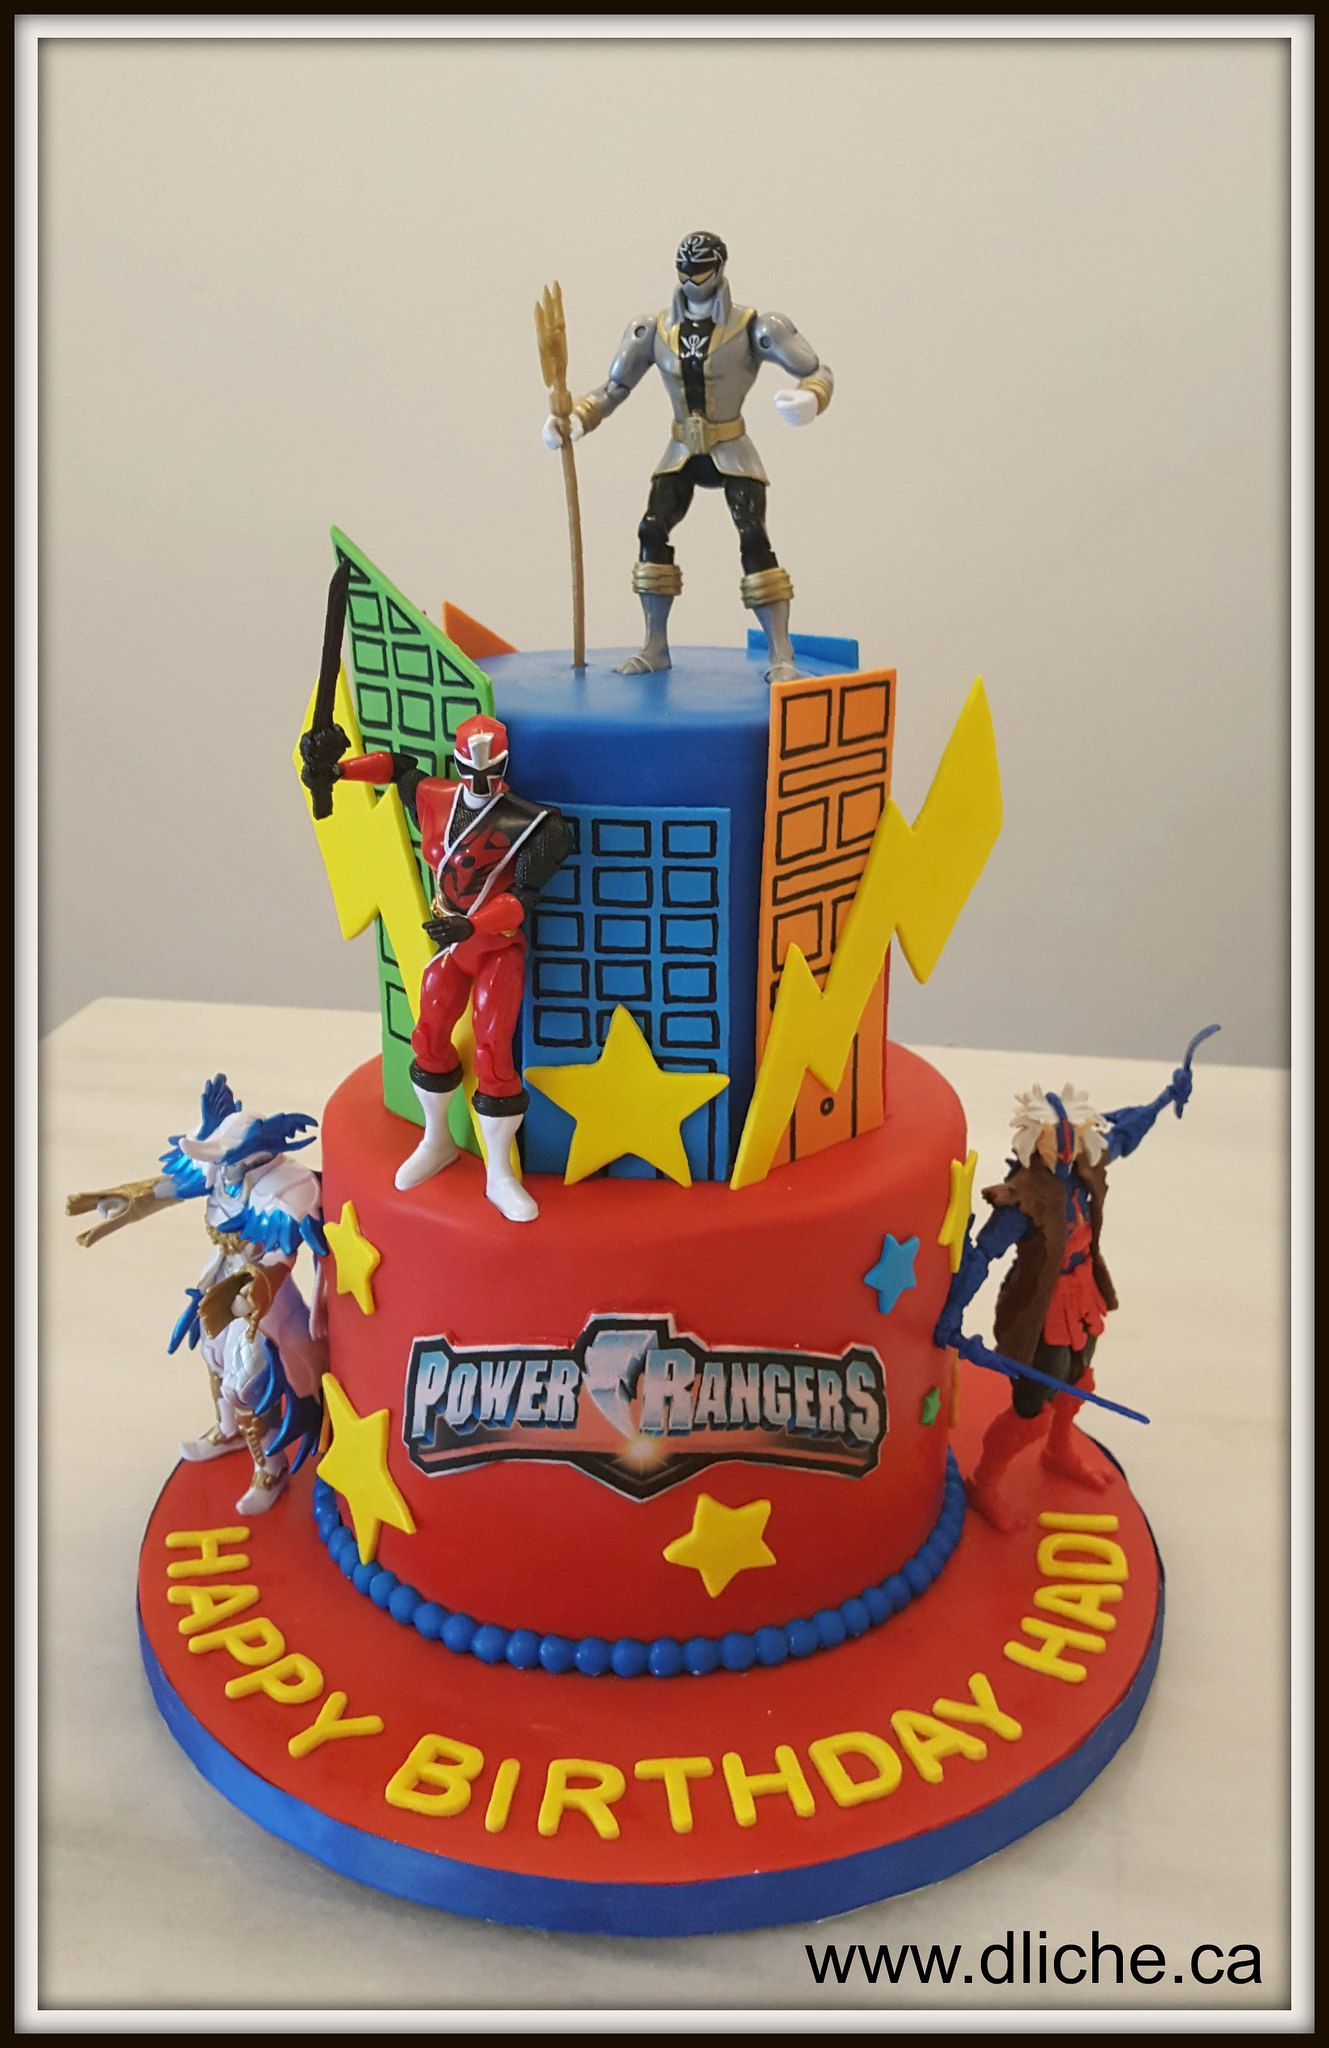 Pleasing Power Rangers Cake Vous Desirez Un Gateau Dexception Pour Birthday Cards Printable Opercafe Filternl